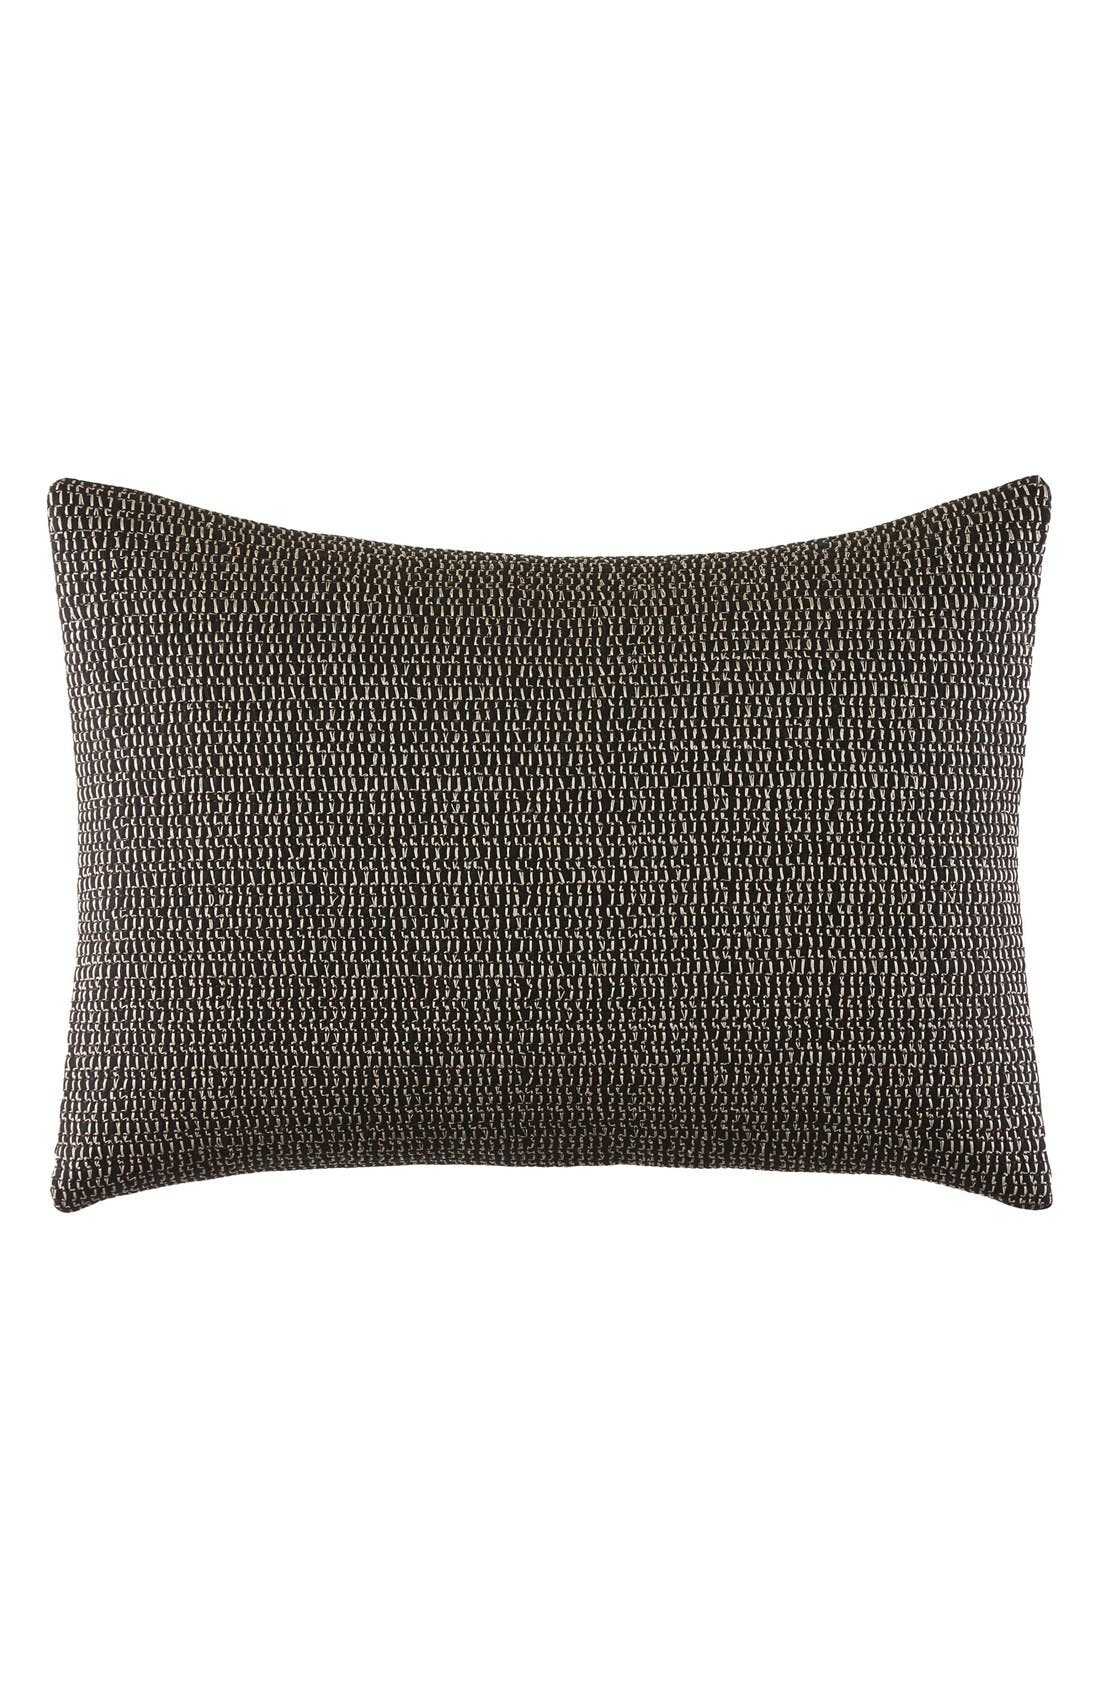 Main Image - Tommy Bahama Jungle Drive Pillow